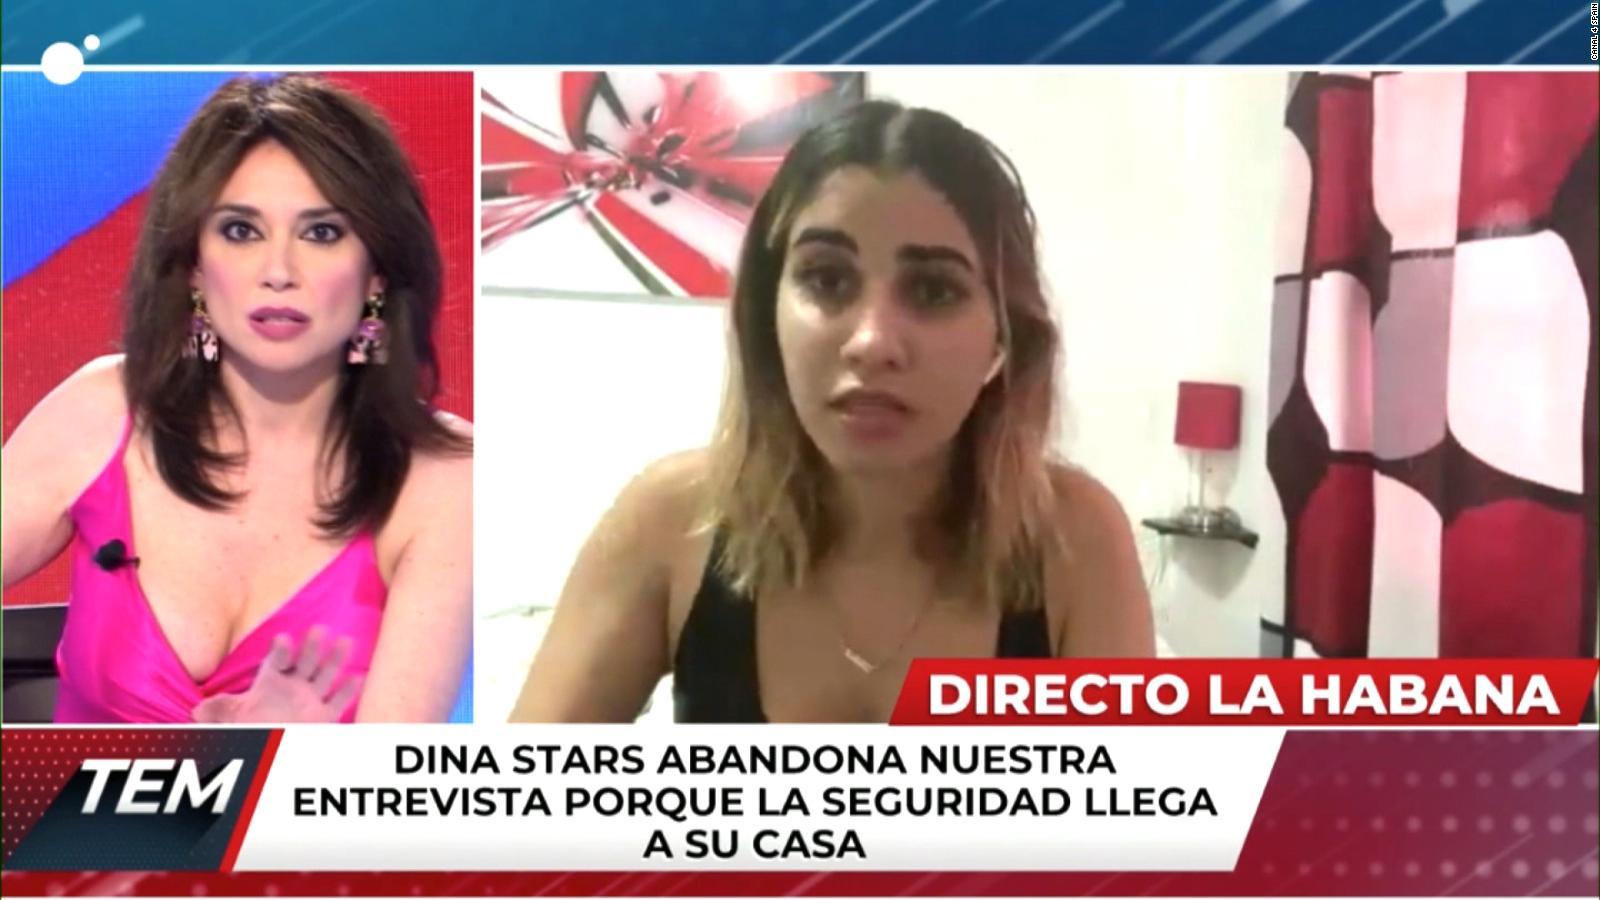 CNN: Cuban YouTuber says she is being taken away b